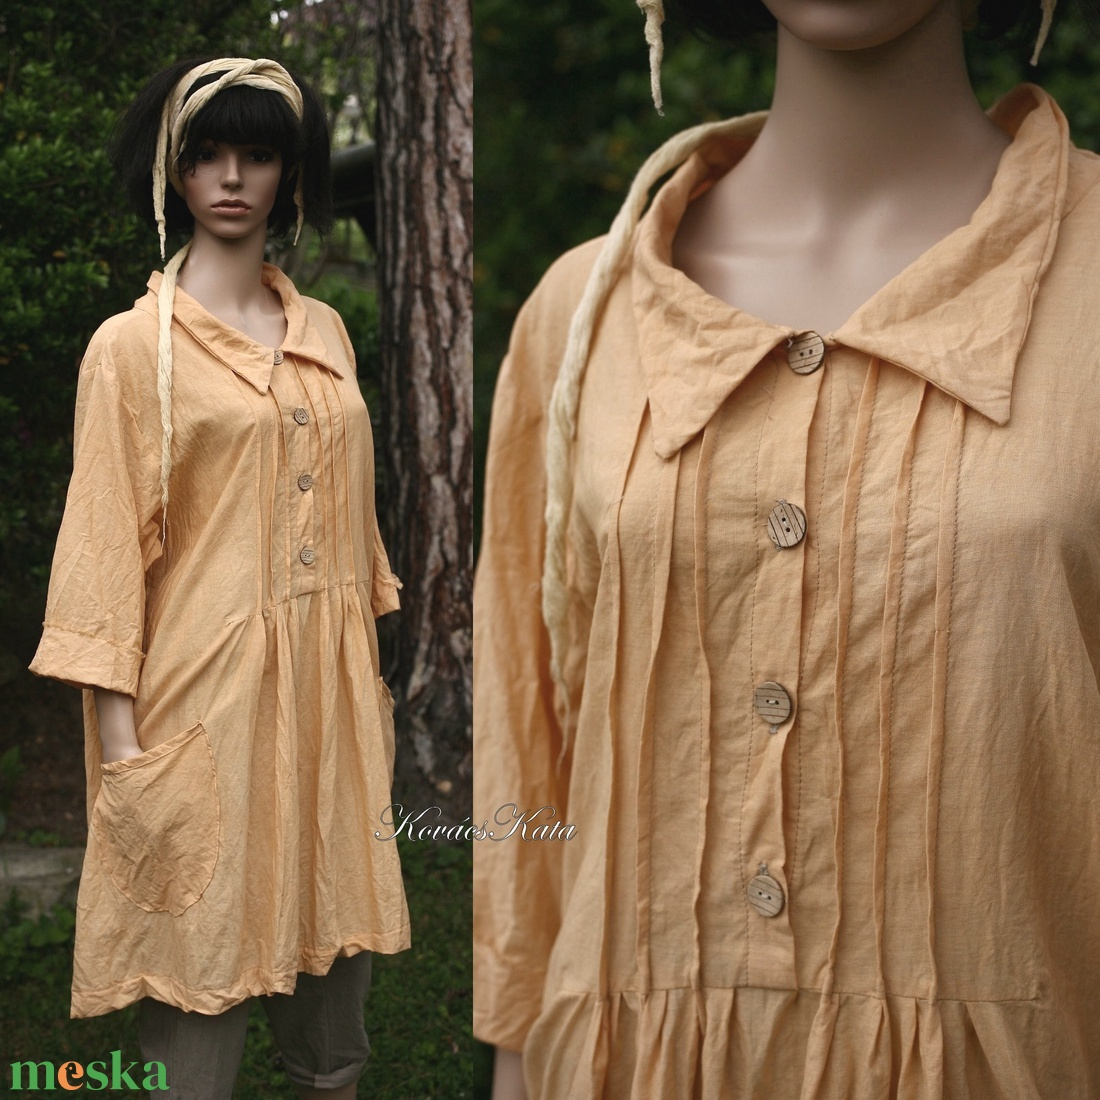 ANNIE -  nap-sárga ingruha  - ruha & divat - női ruha - ruha - Meska.hu